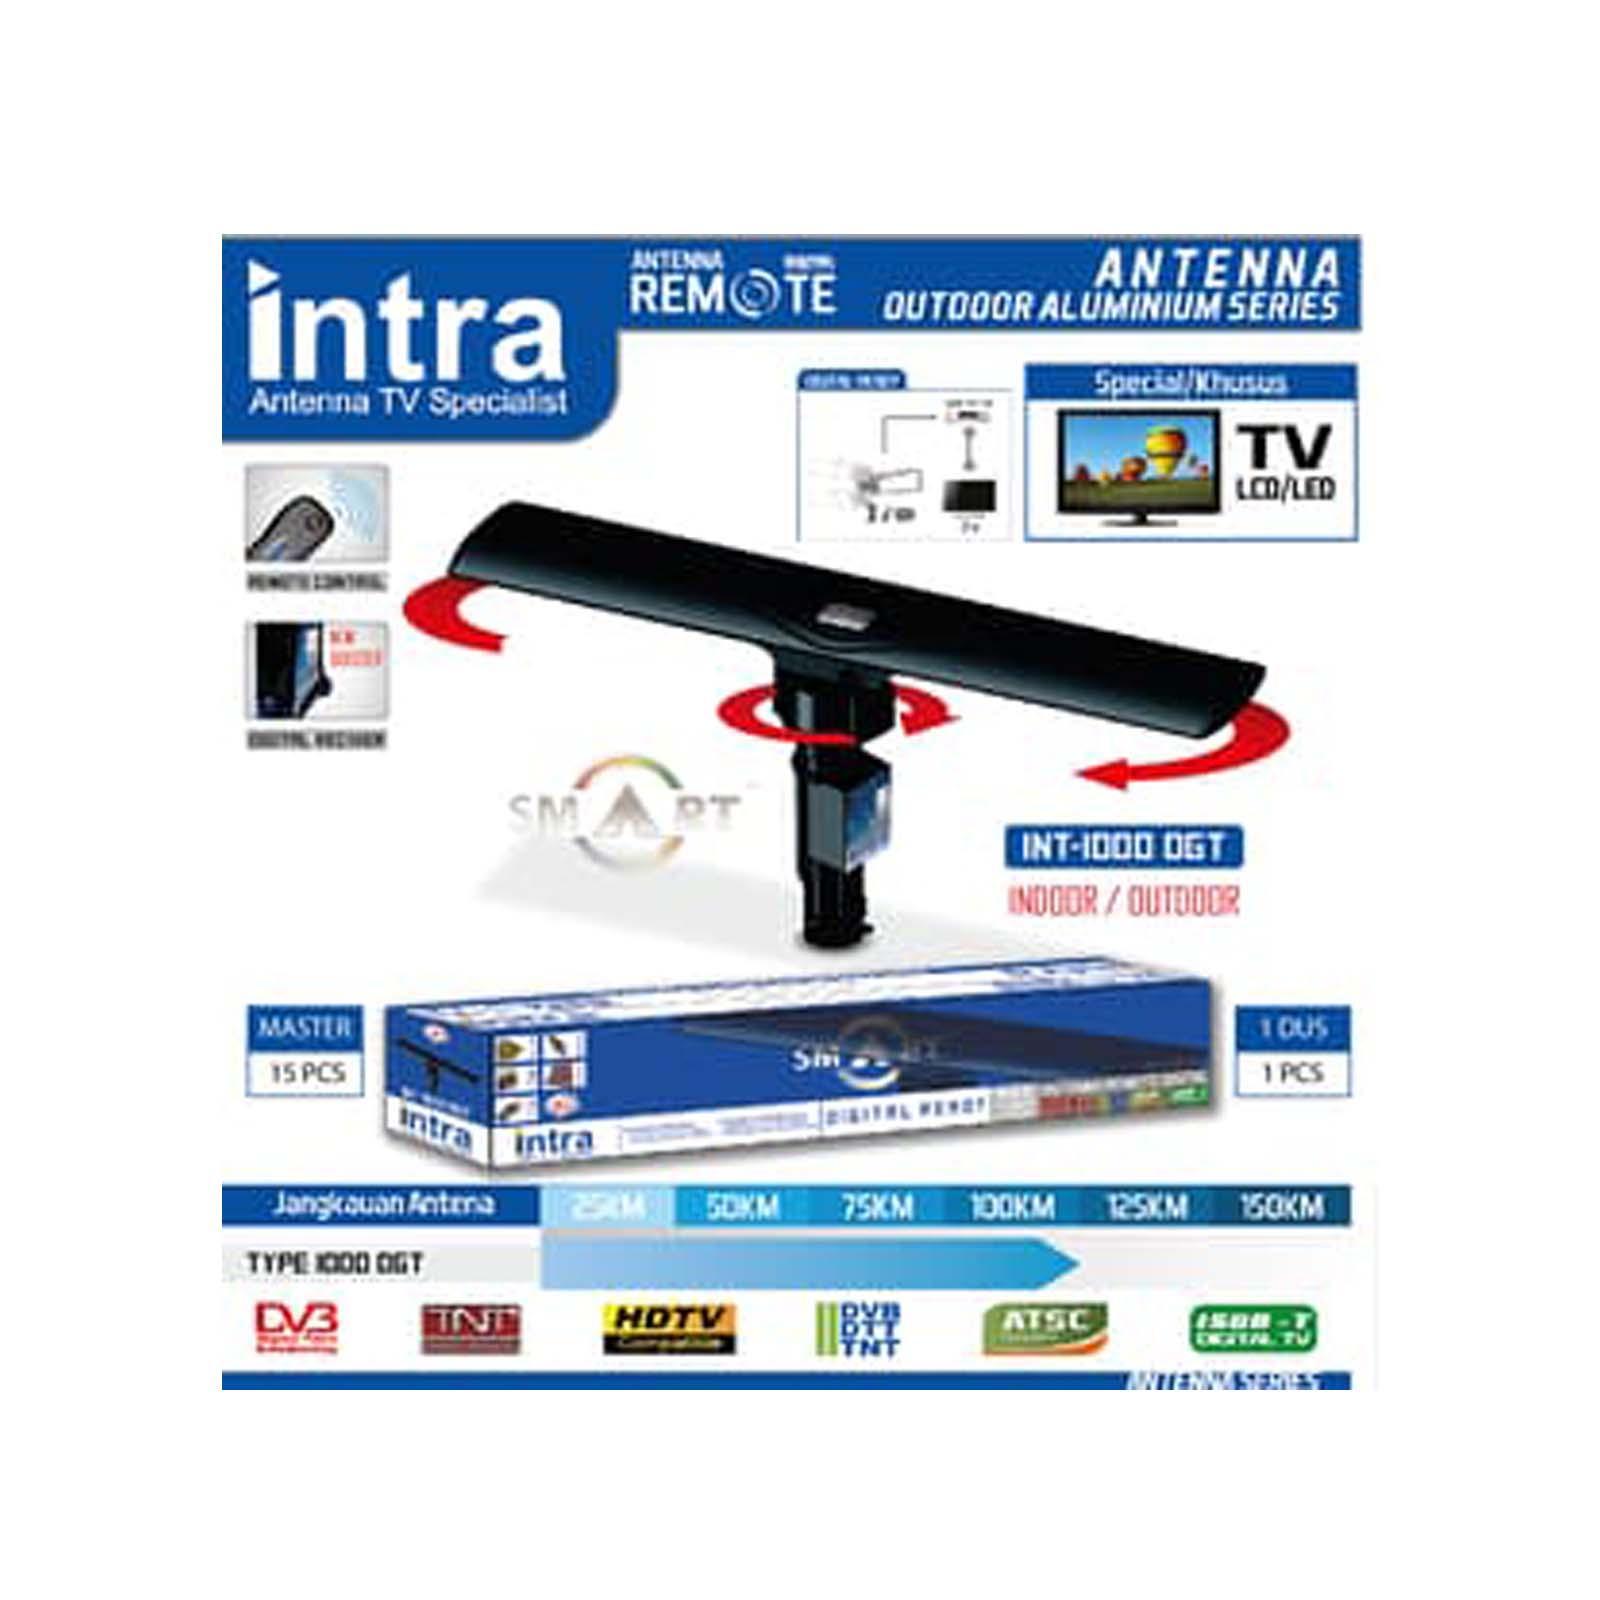 intra antena tv outdoor – smart digital antena ( hd 1080p resolution ) int-1000 dg